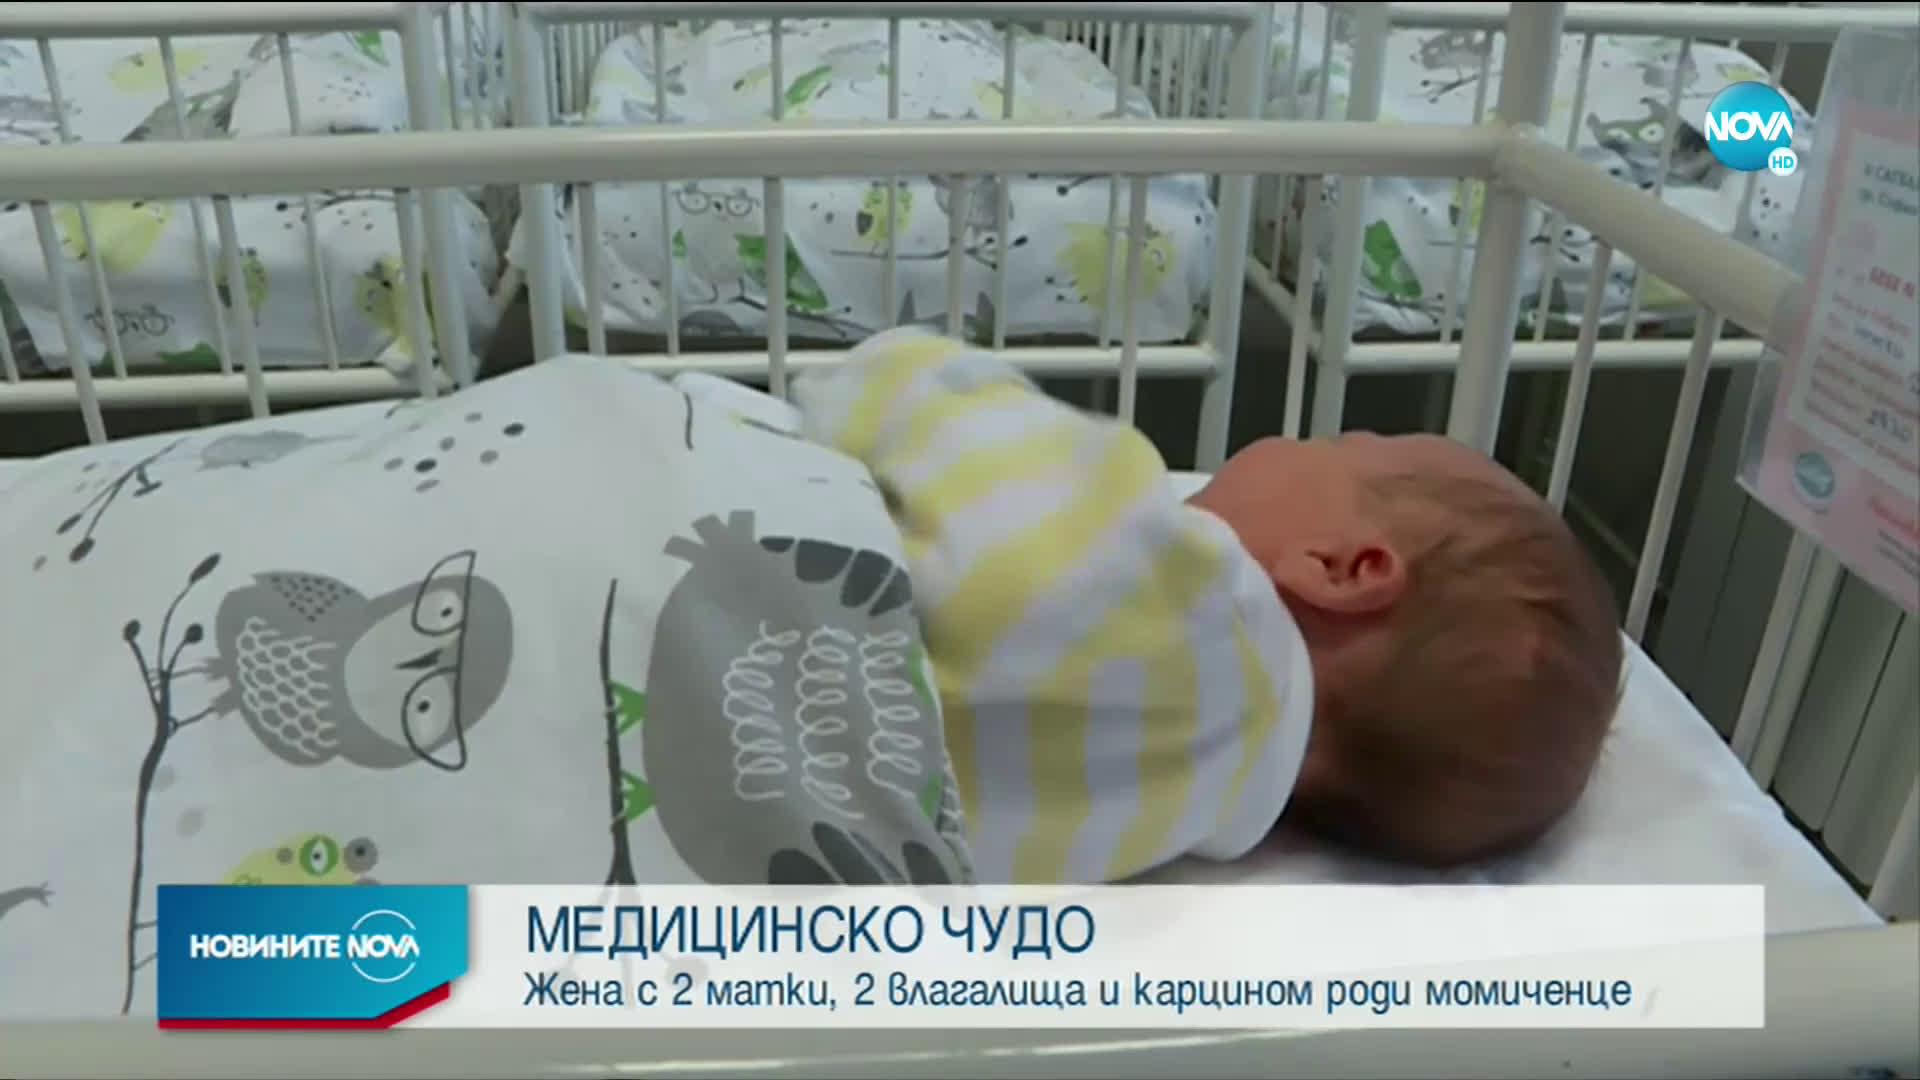 МЕДИЦИНСКО ЧУДО: Жена с две матки роди здраво дете